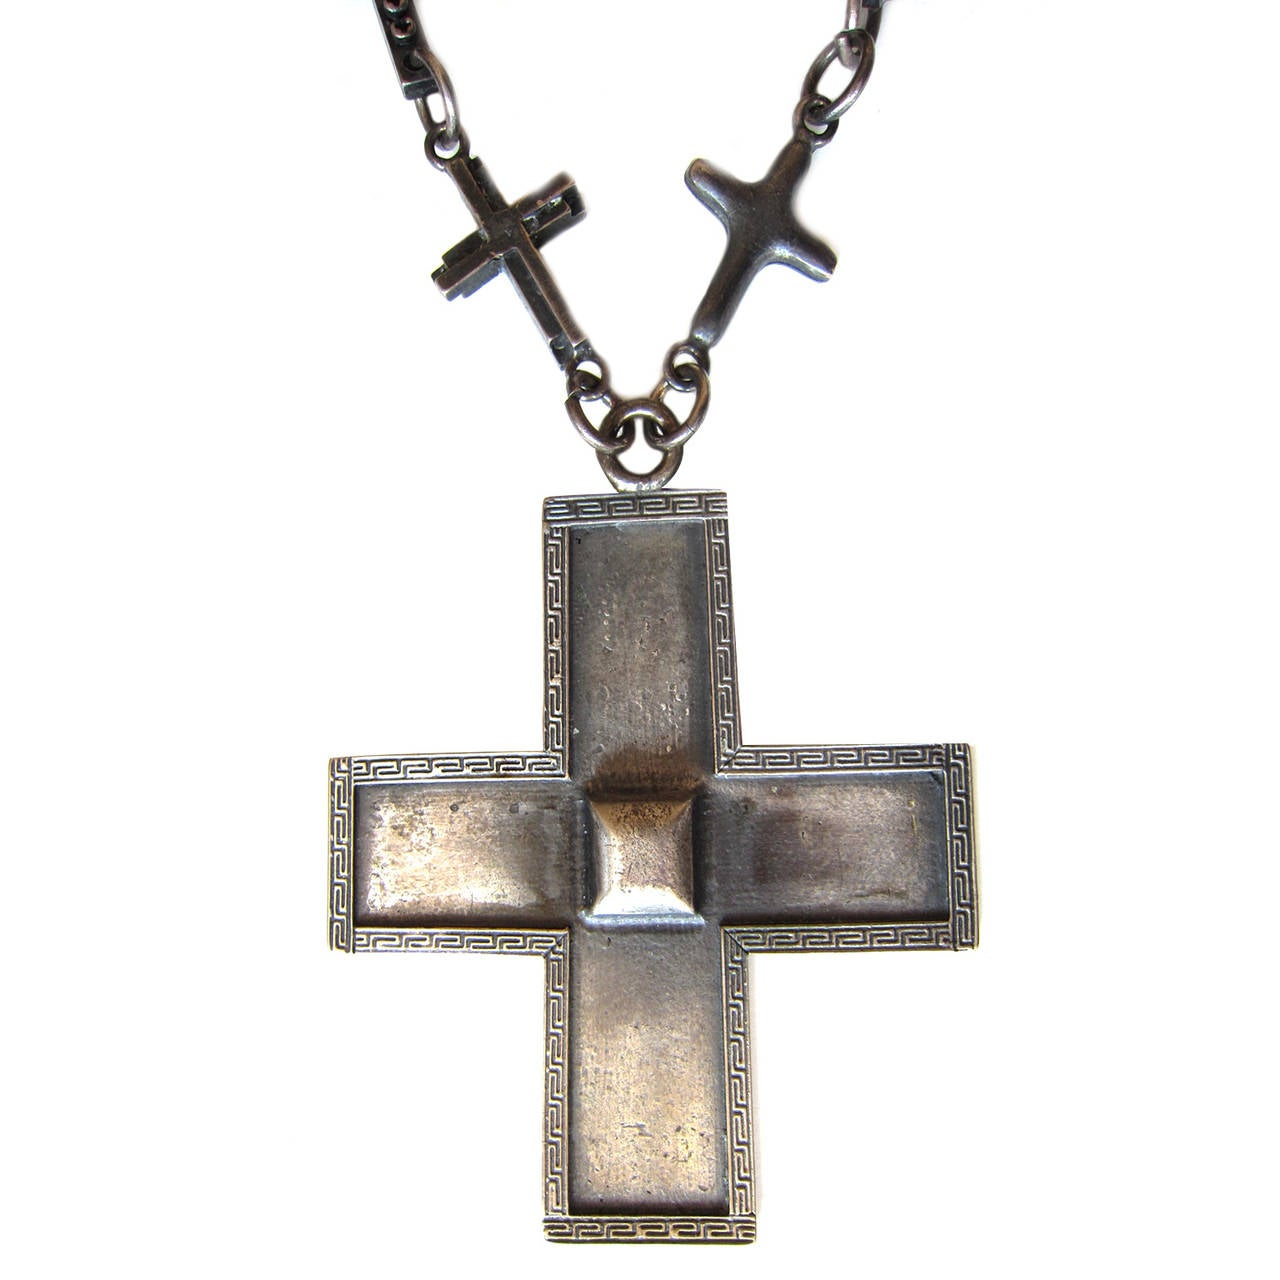 Gianni Versace Massive Cross Necklace 1990's 2